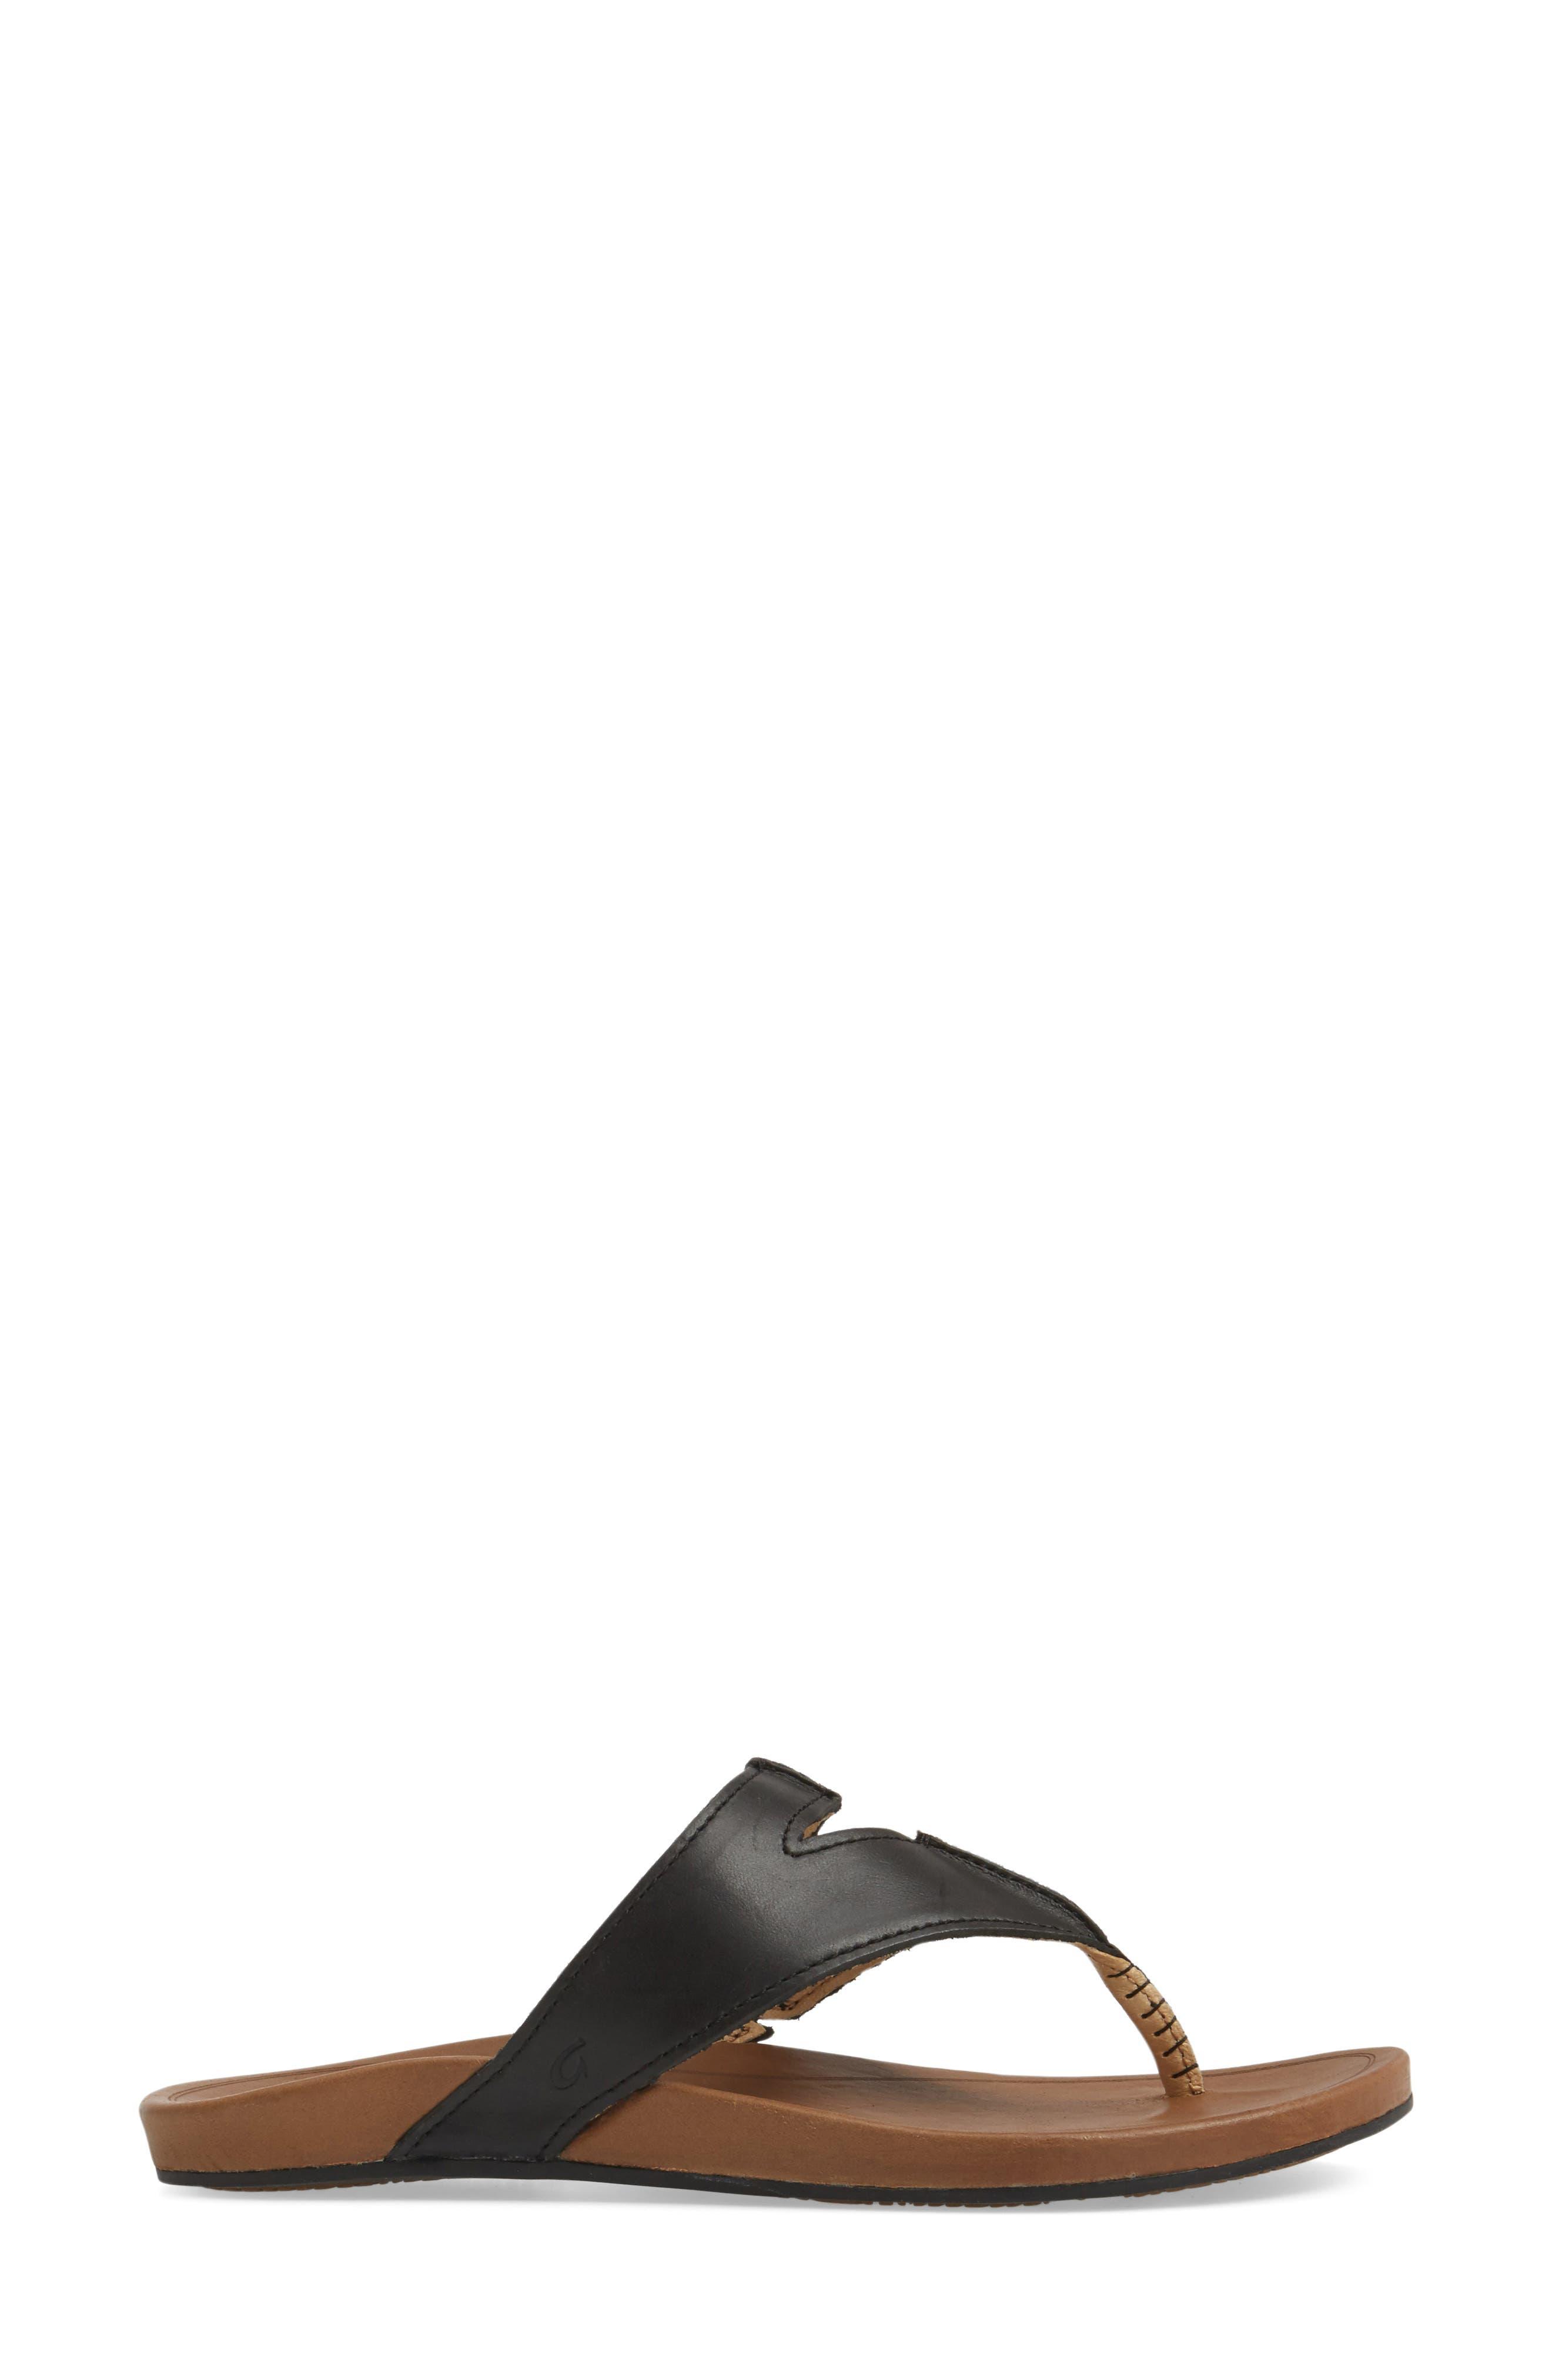 Lala Flip Flop,                             Alternate thumbnail 3, color,                             BLACK/ TAN LEATHER